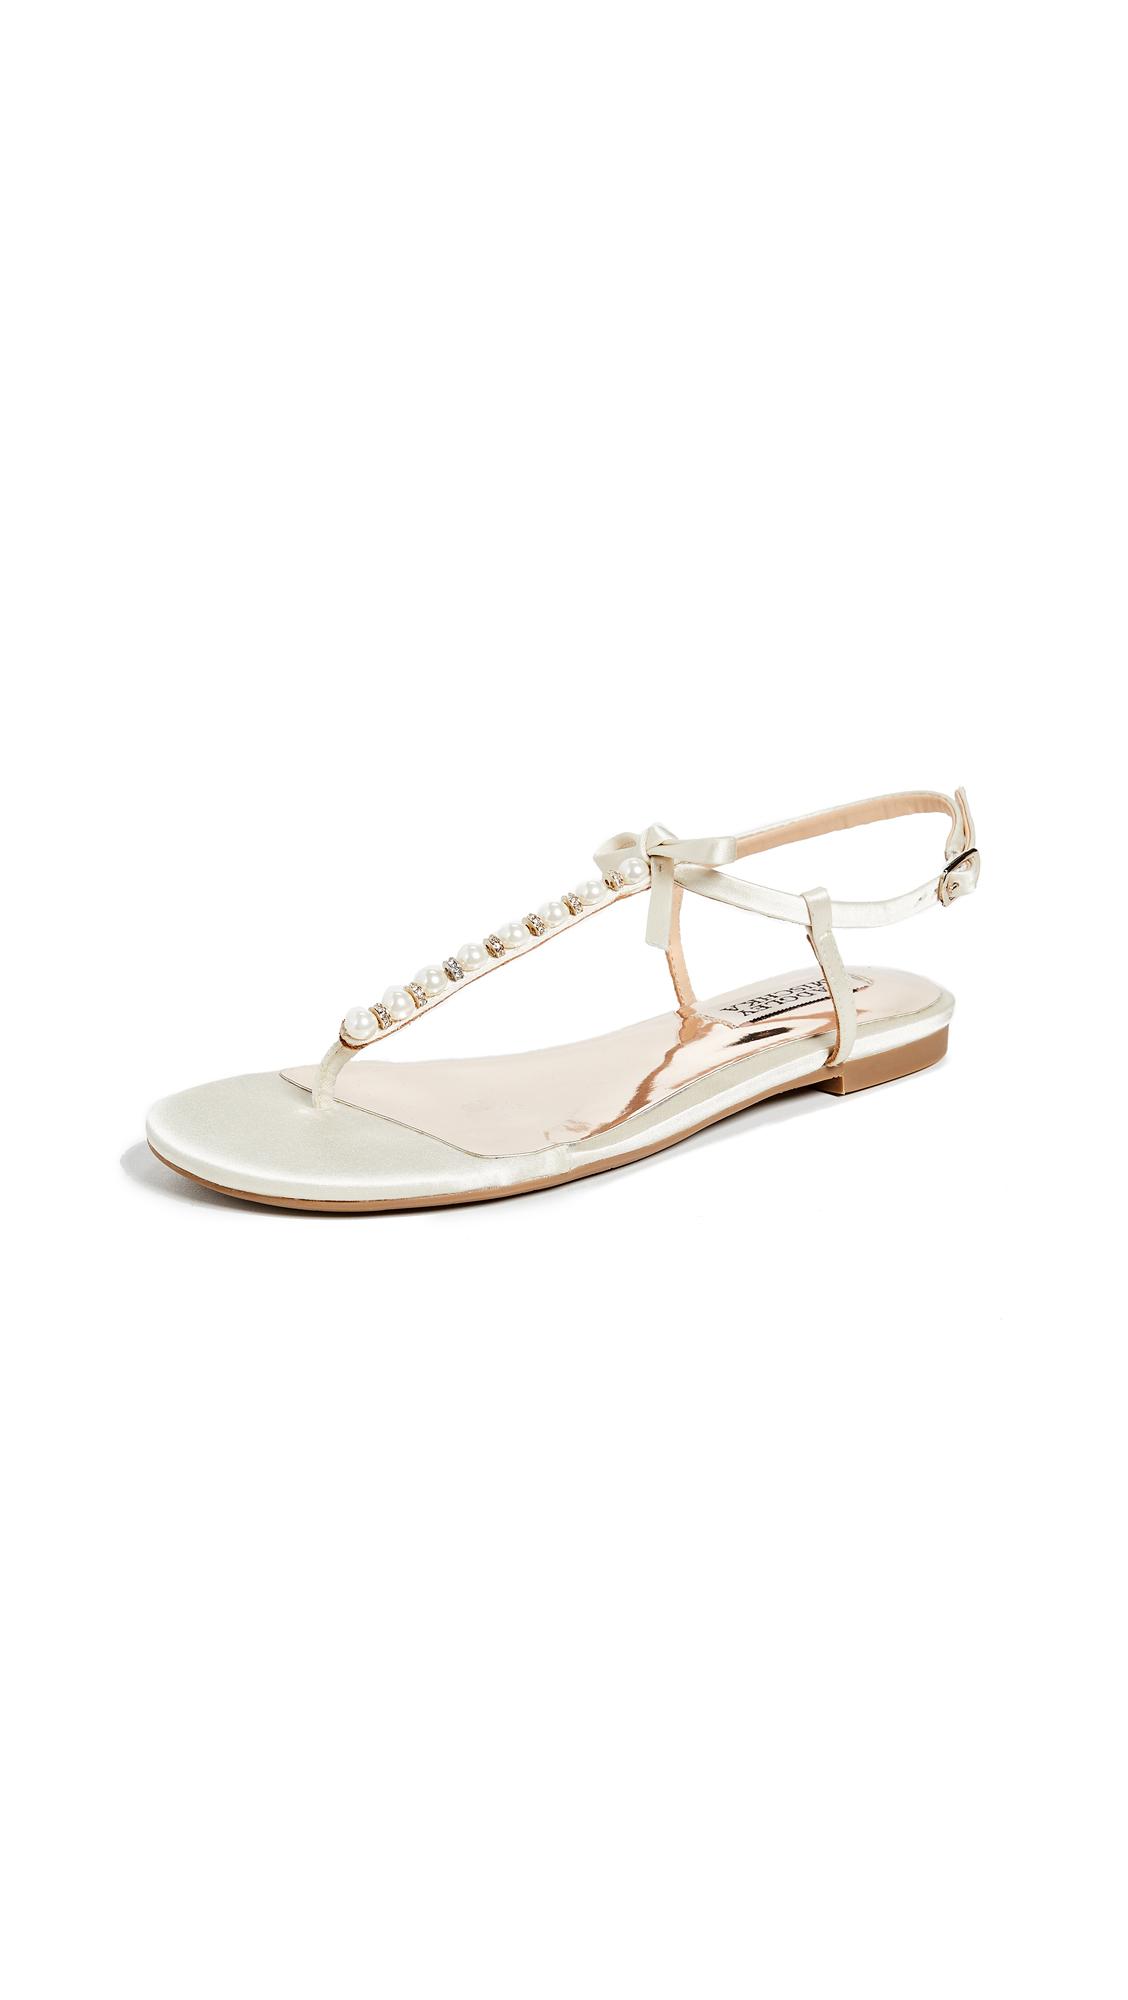 Photo of Badgley Mischka Honey Imitation Pearl T-Strap Sandals - buy Badgley Mischka shoes